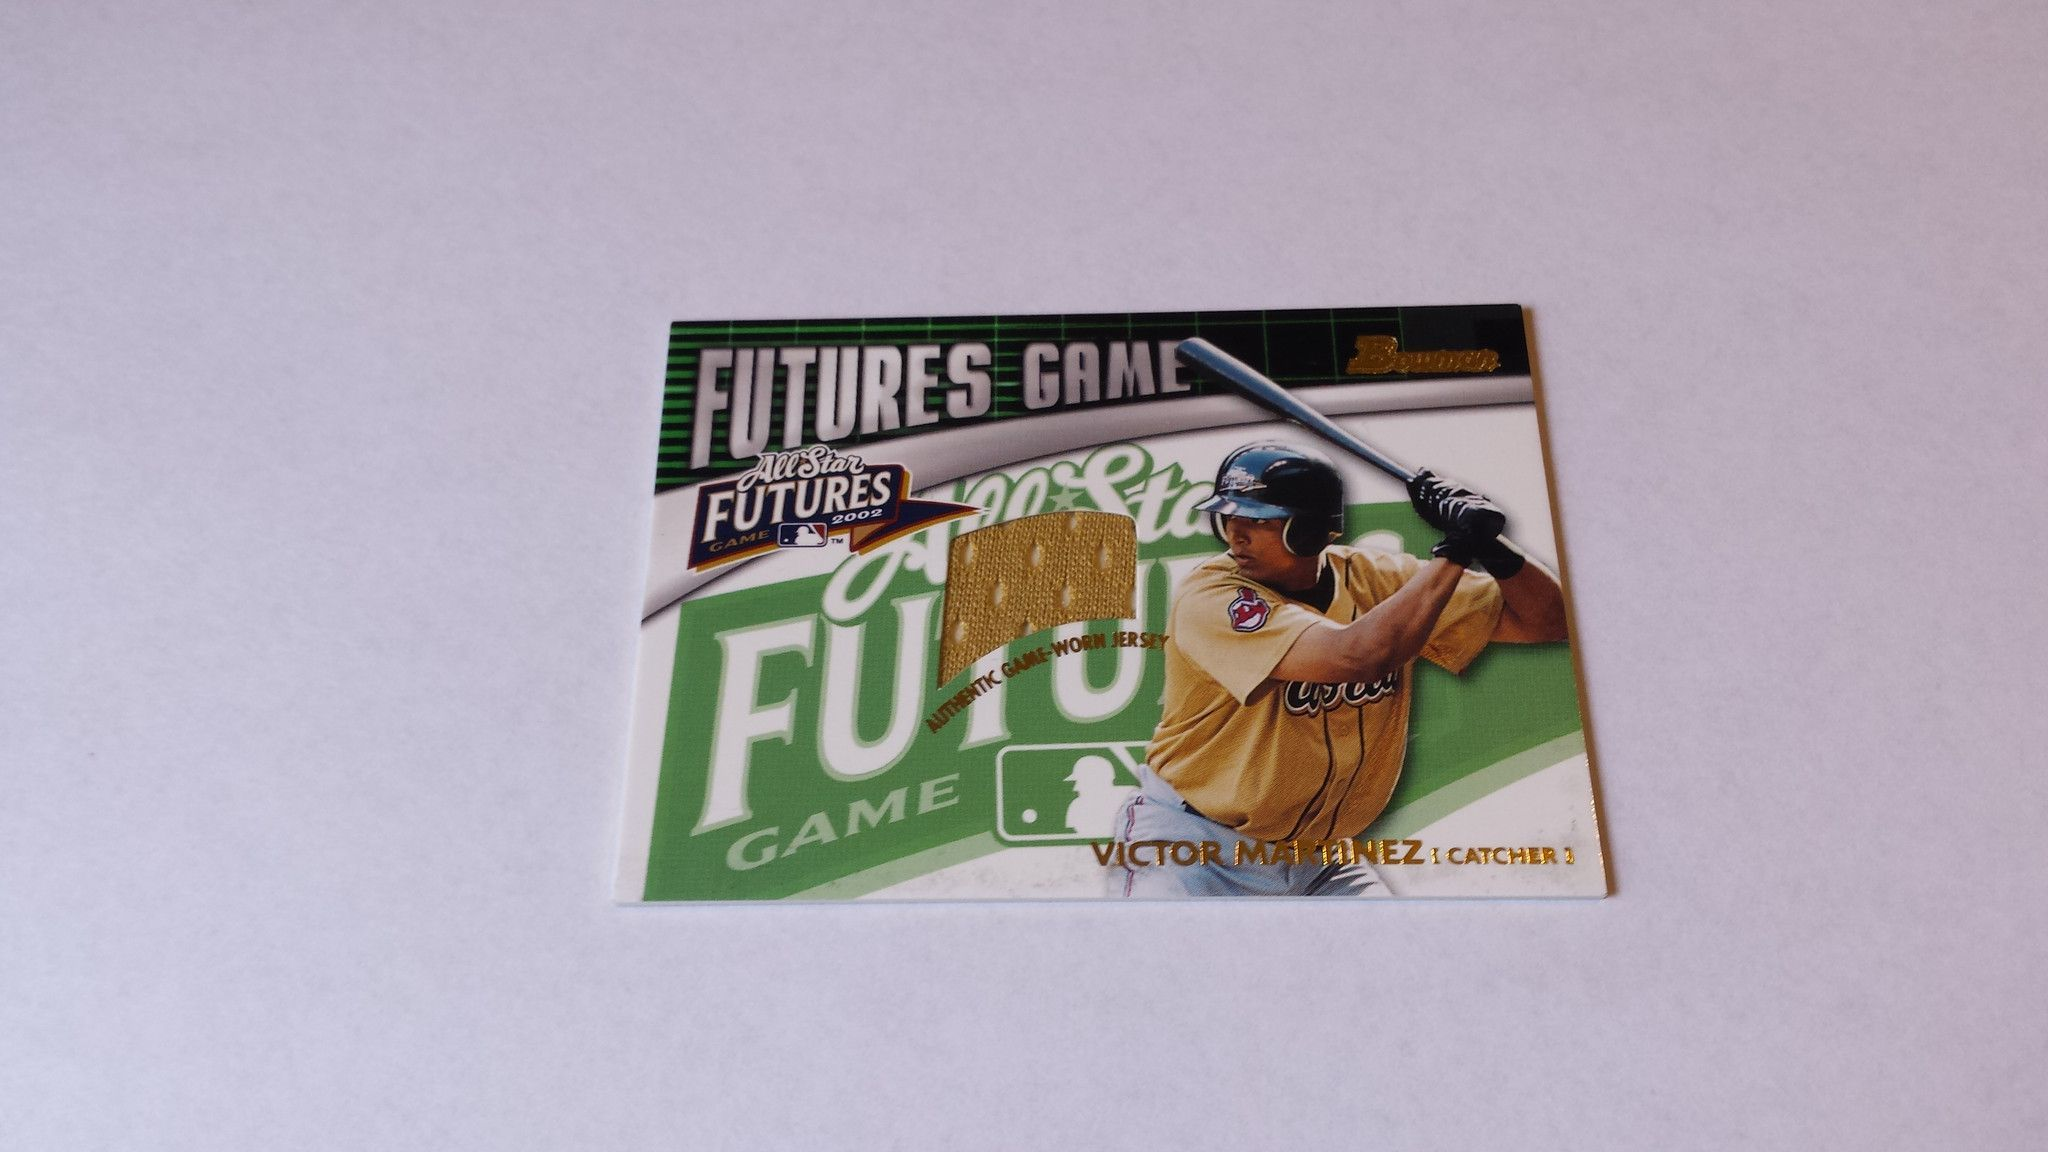 2003 Bowman Futures Game Gear Jersey Relics Victor Martinez single jersey baseball card